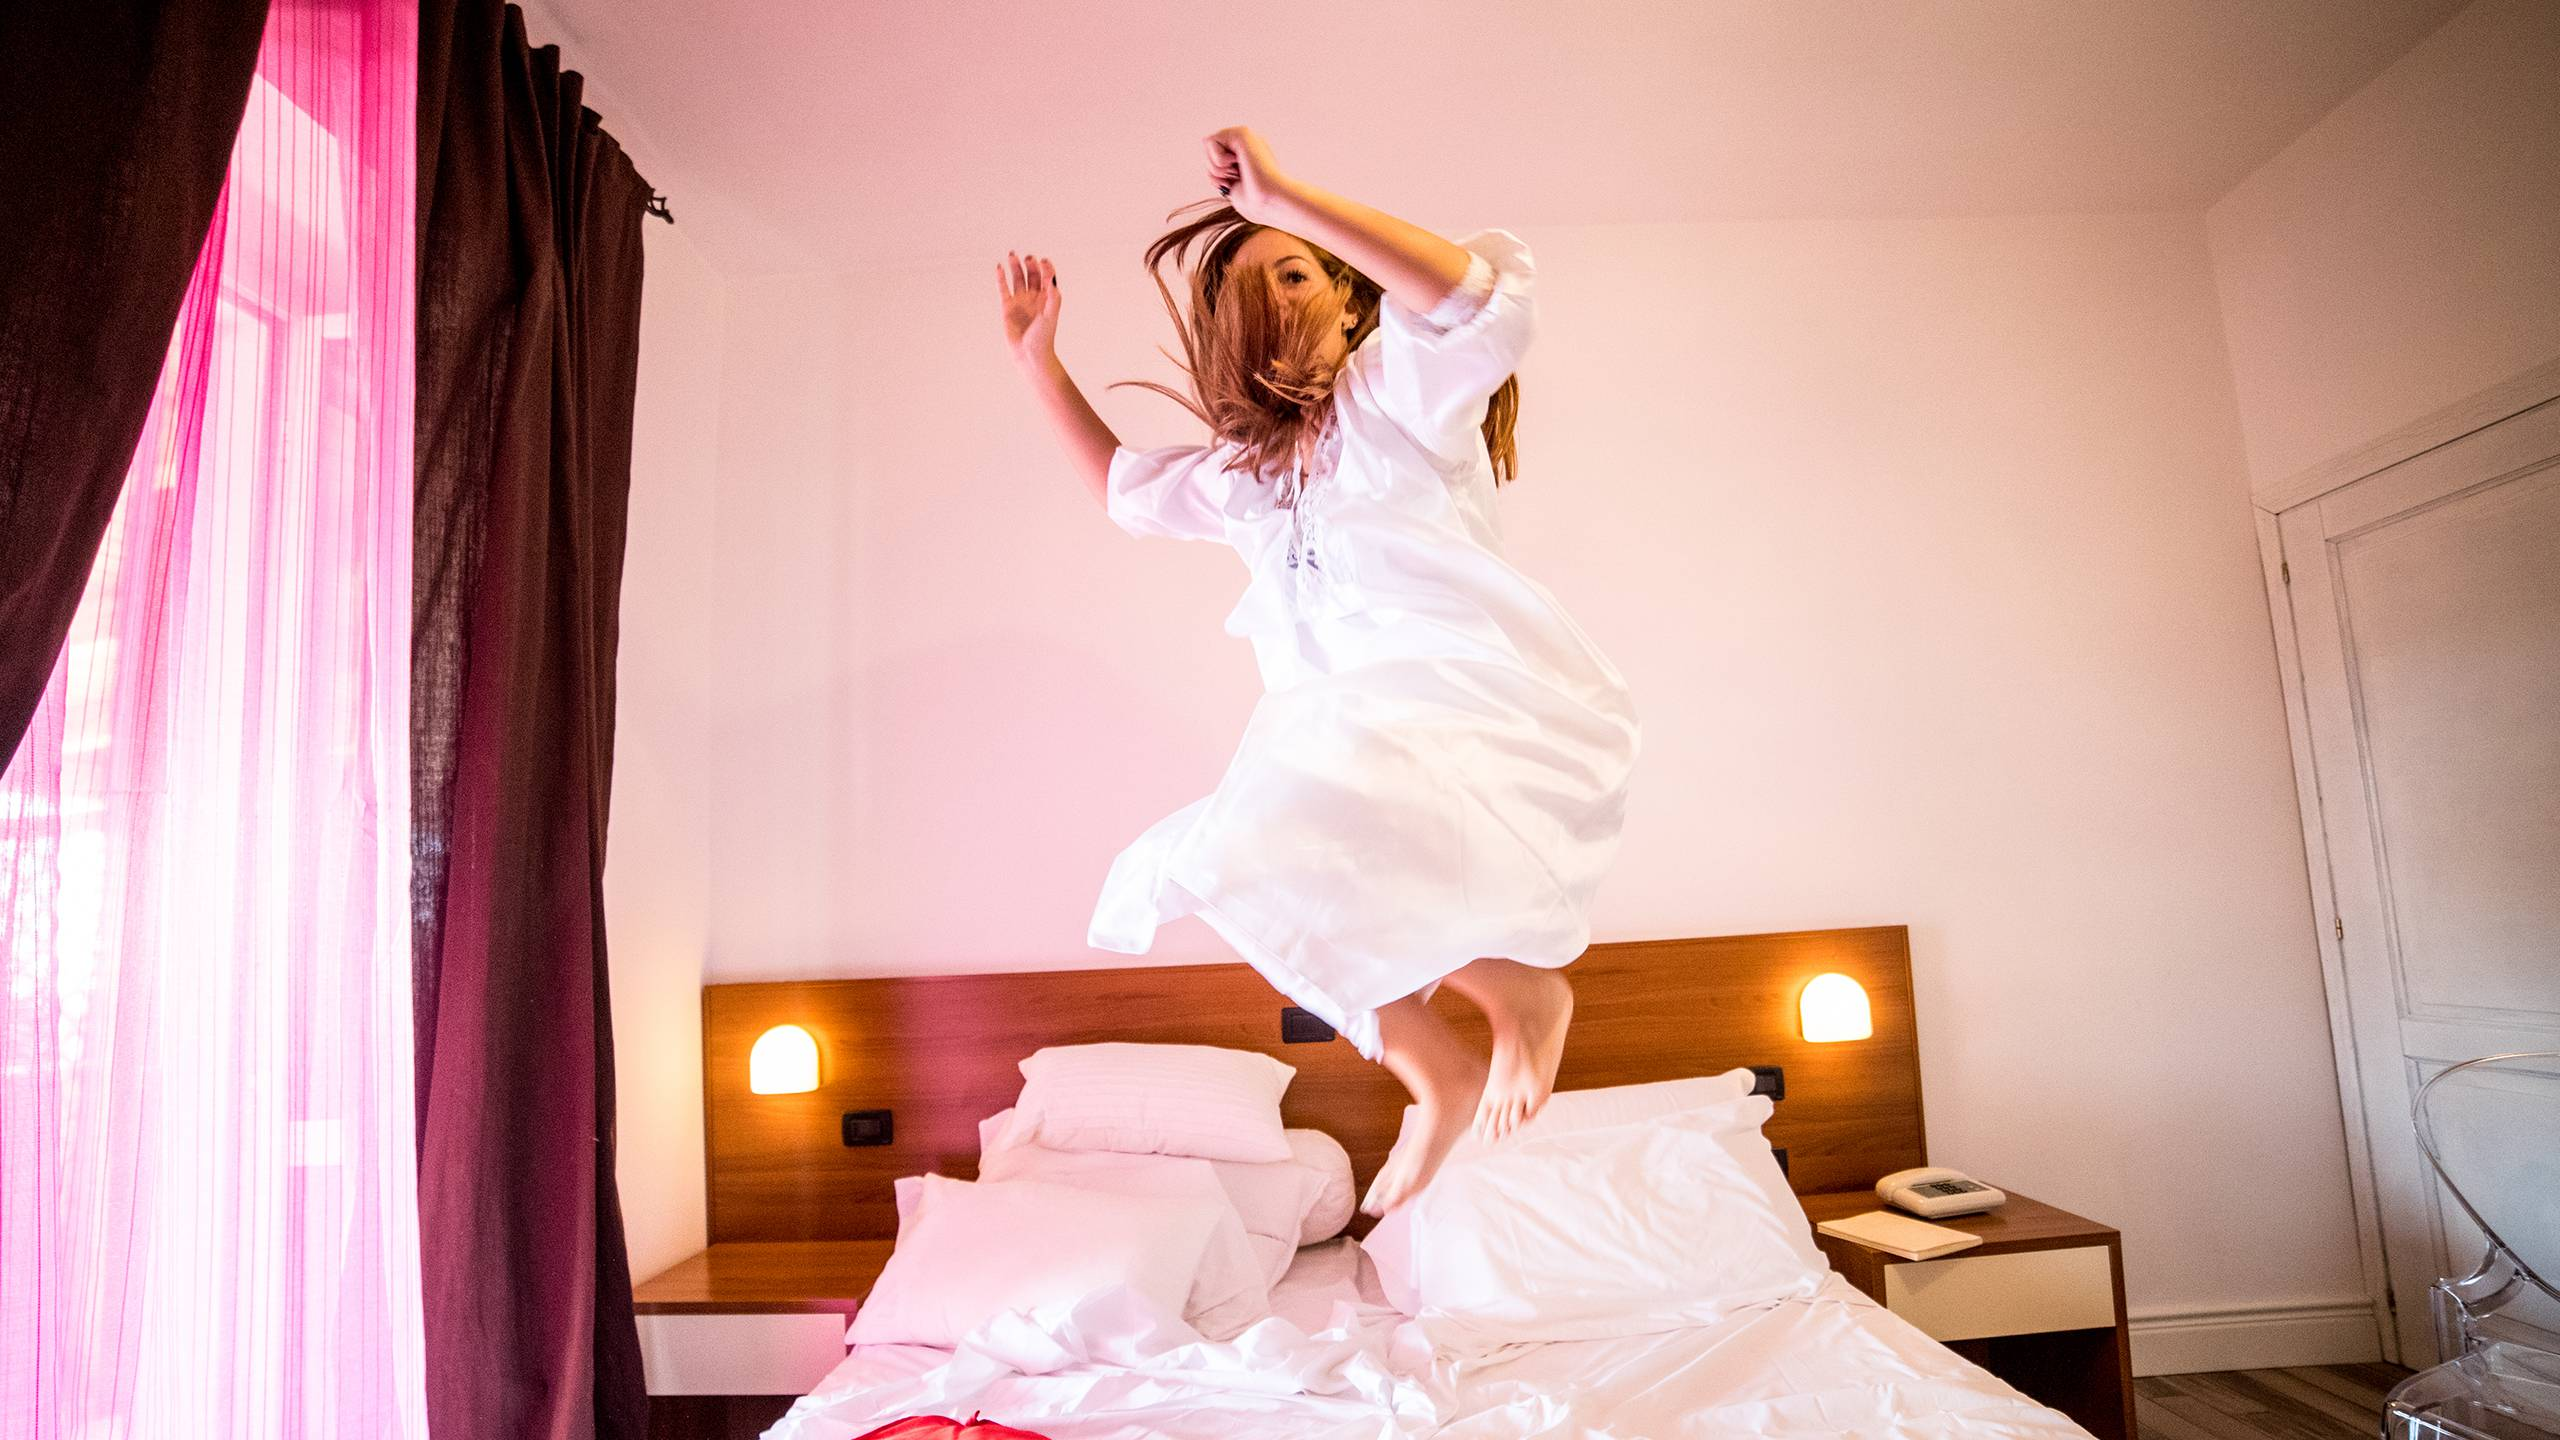 Hotel-Tuscania-Panoramico-Tuscania-Viterbo-room-bed-blankets-2-C14I2973